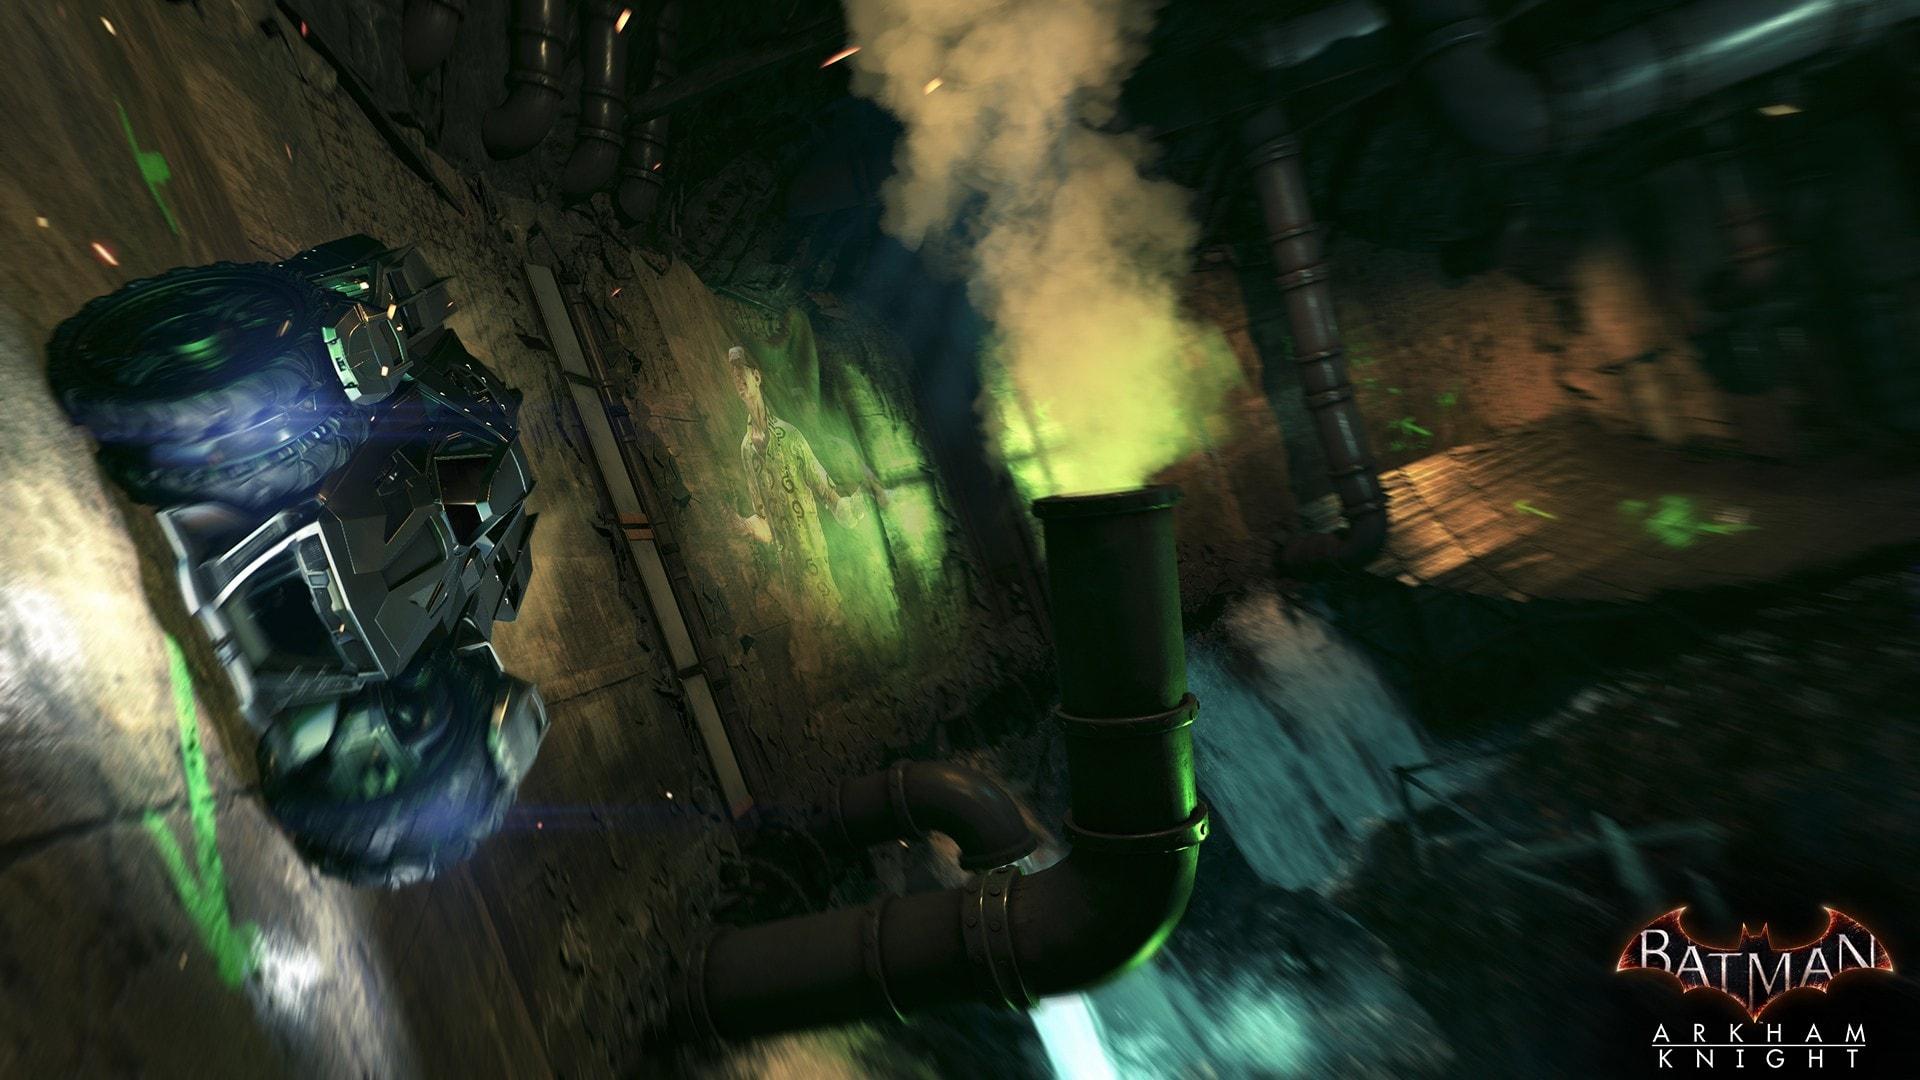 Batman Arkham Knight 2015 Video Game 4k Hd Desktop: 50 Set Of Batman : Arkham Knight Wallpaper 1920 X 1080 HD